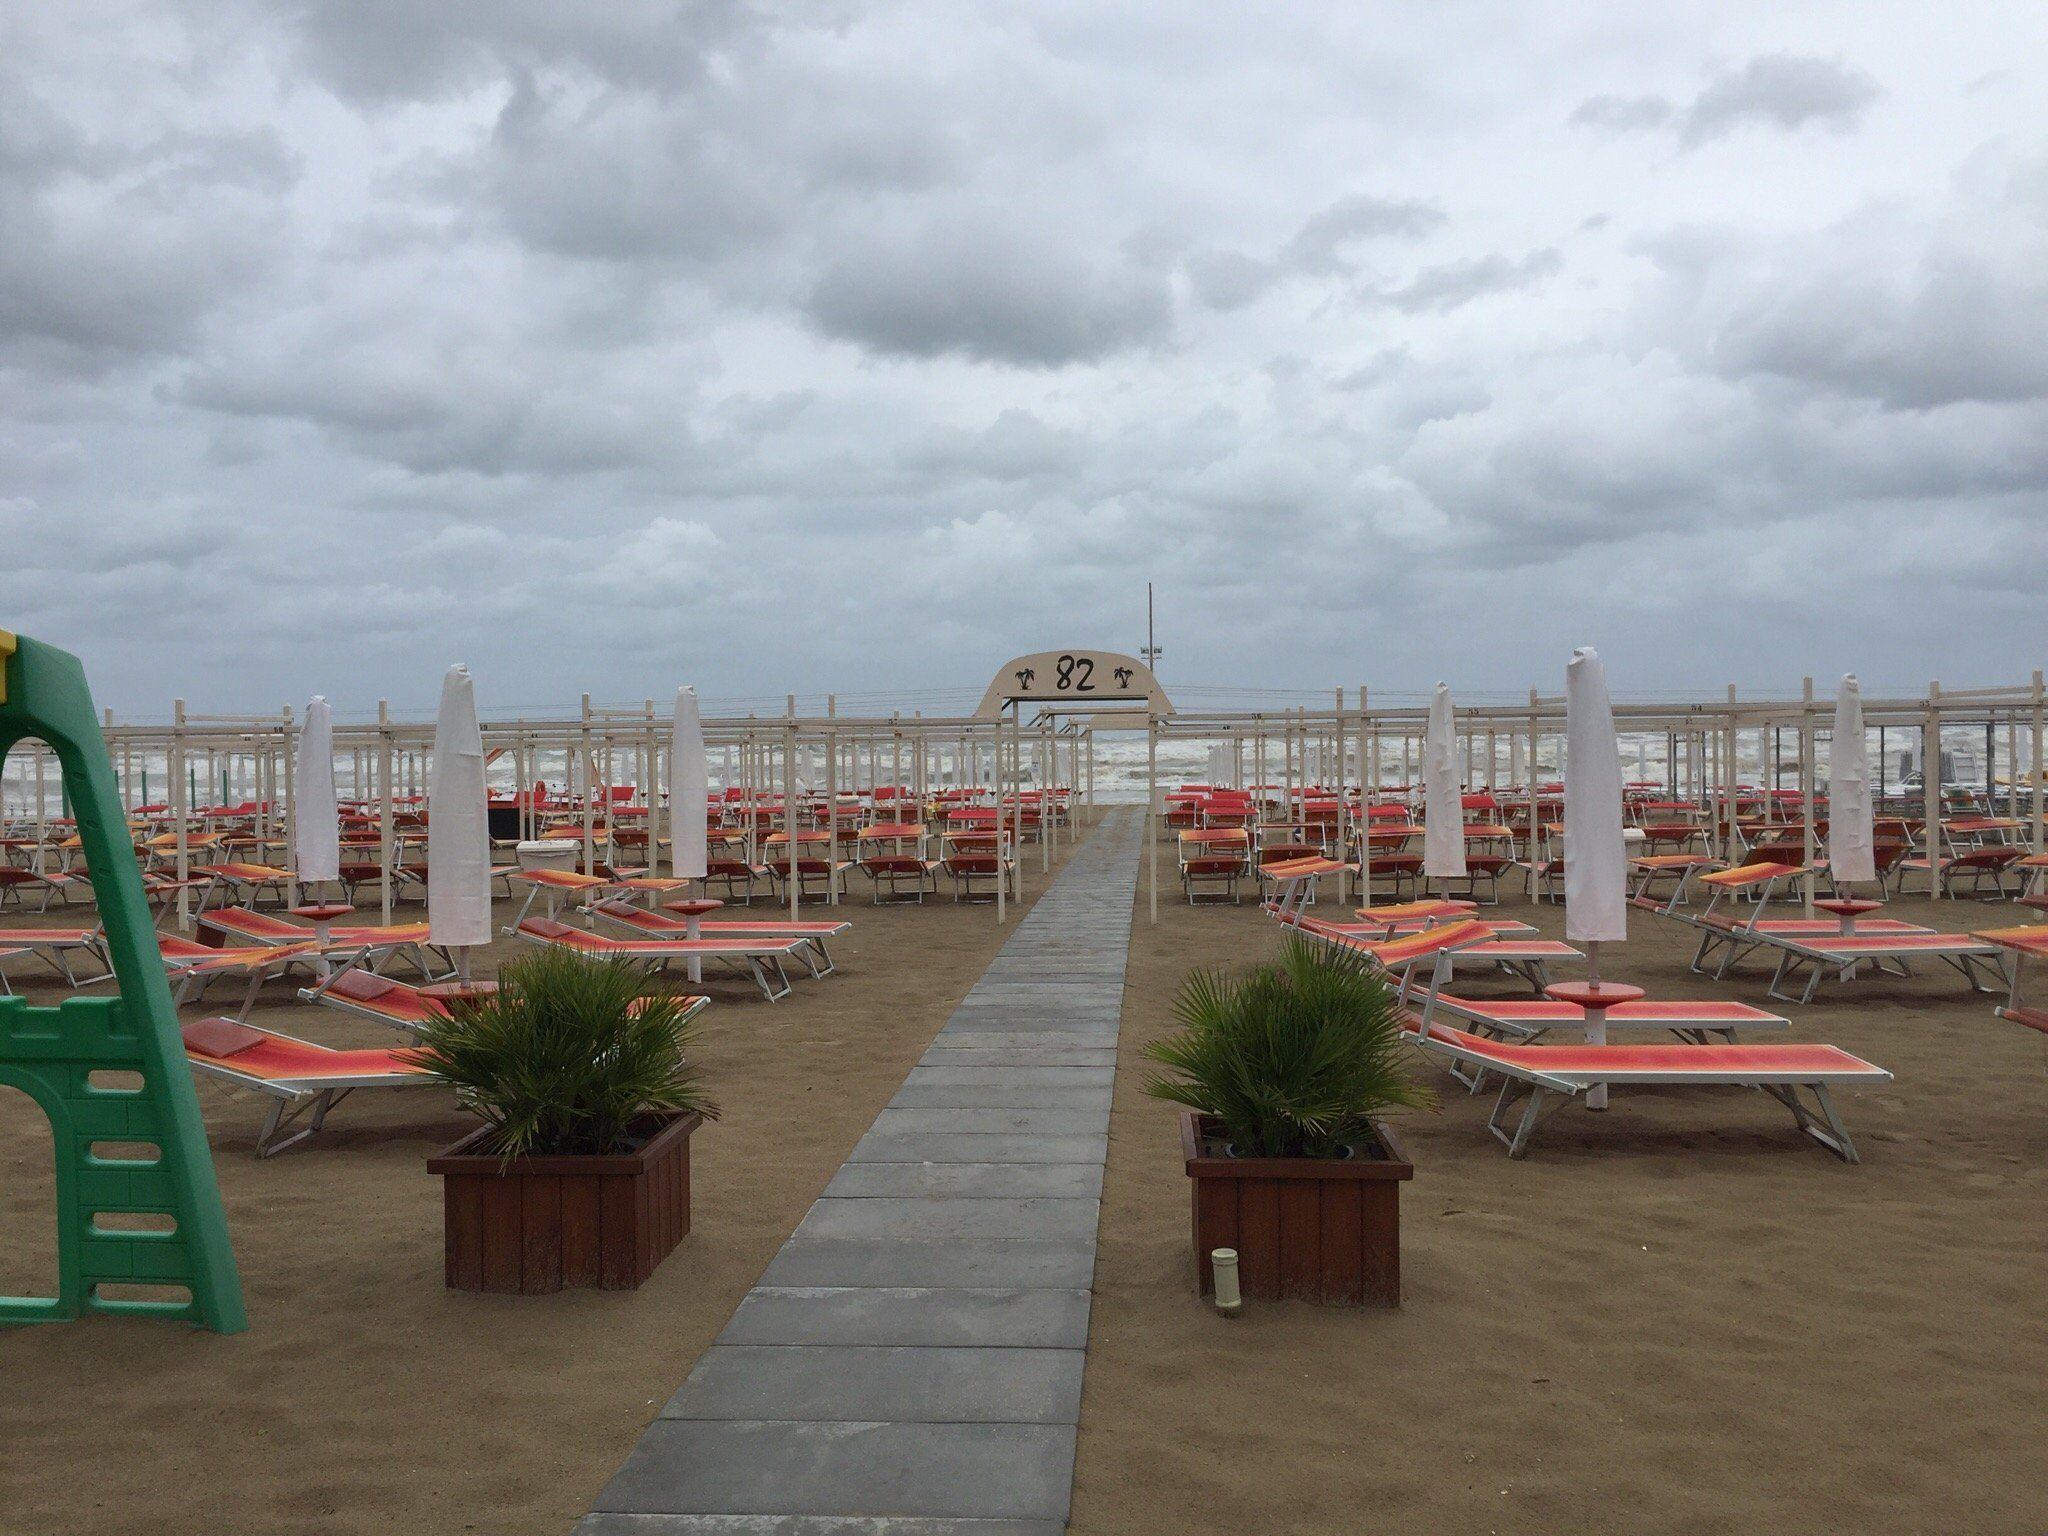 Bagno 82 Riccione Italy Top Tips Before You Go Tripadvisor